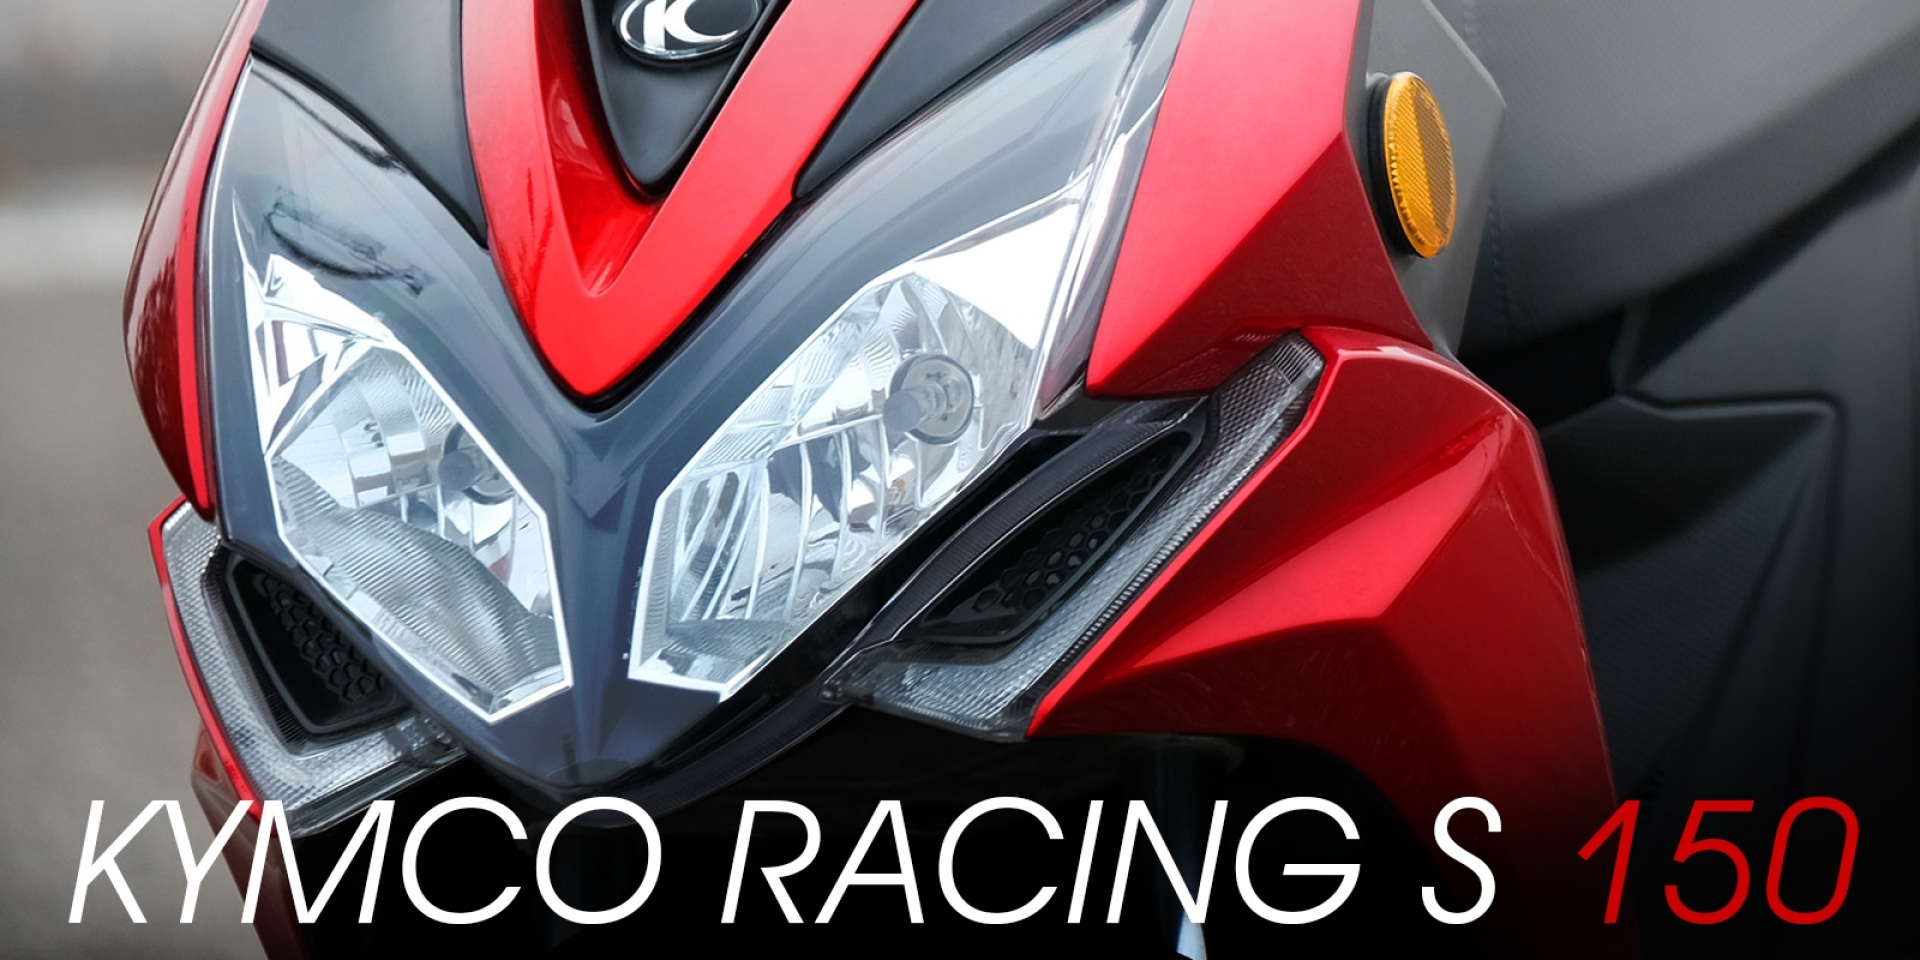 KYMCO RACING S 150原型車試駕報告